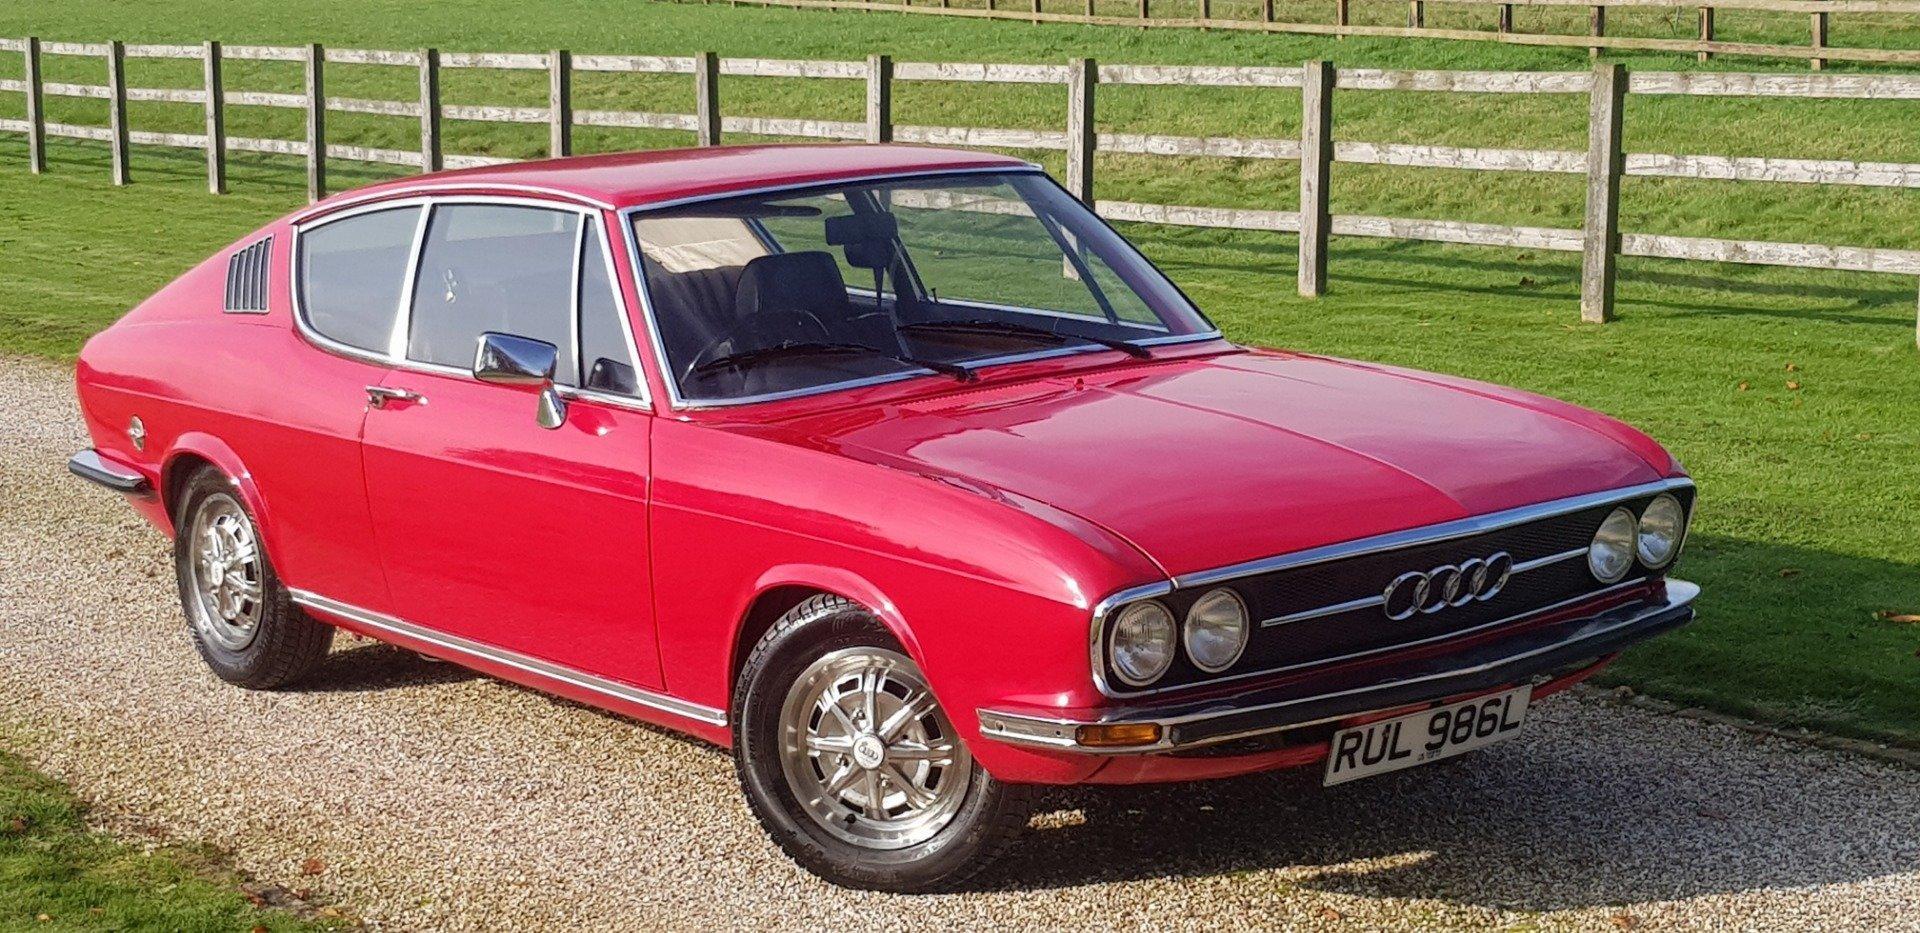 Audi 100 Coupe S 1975 uploads